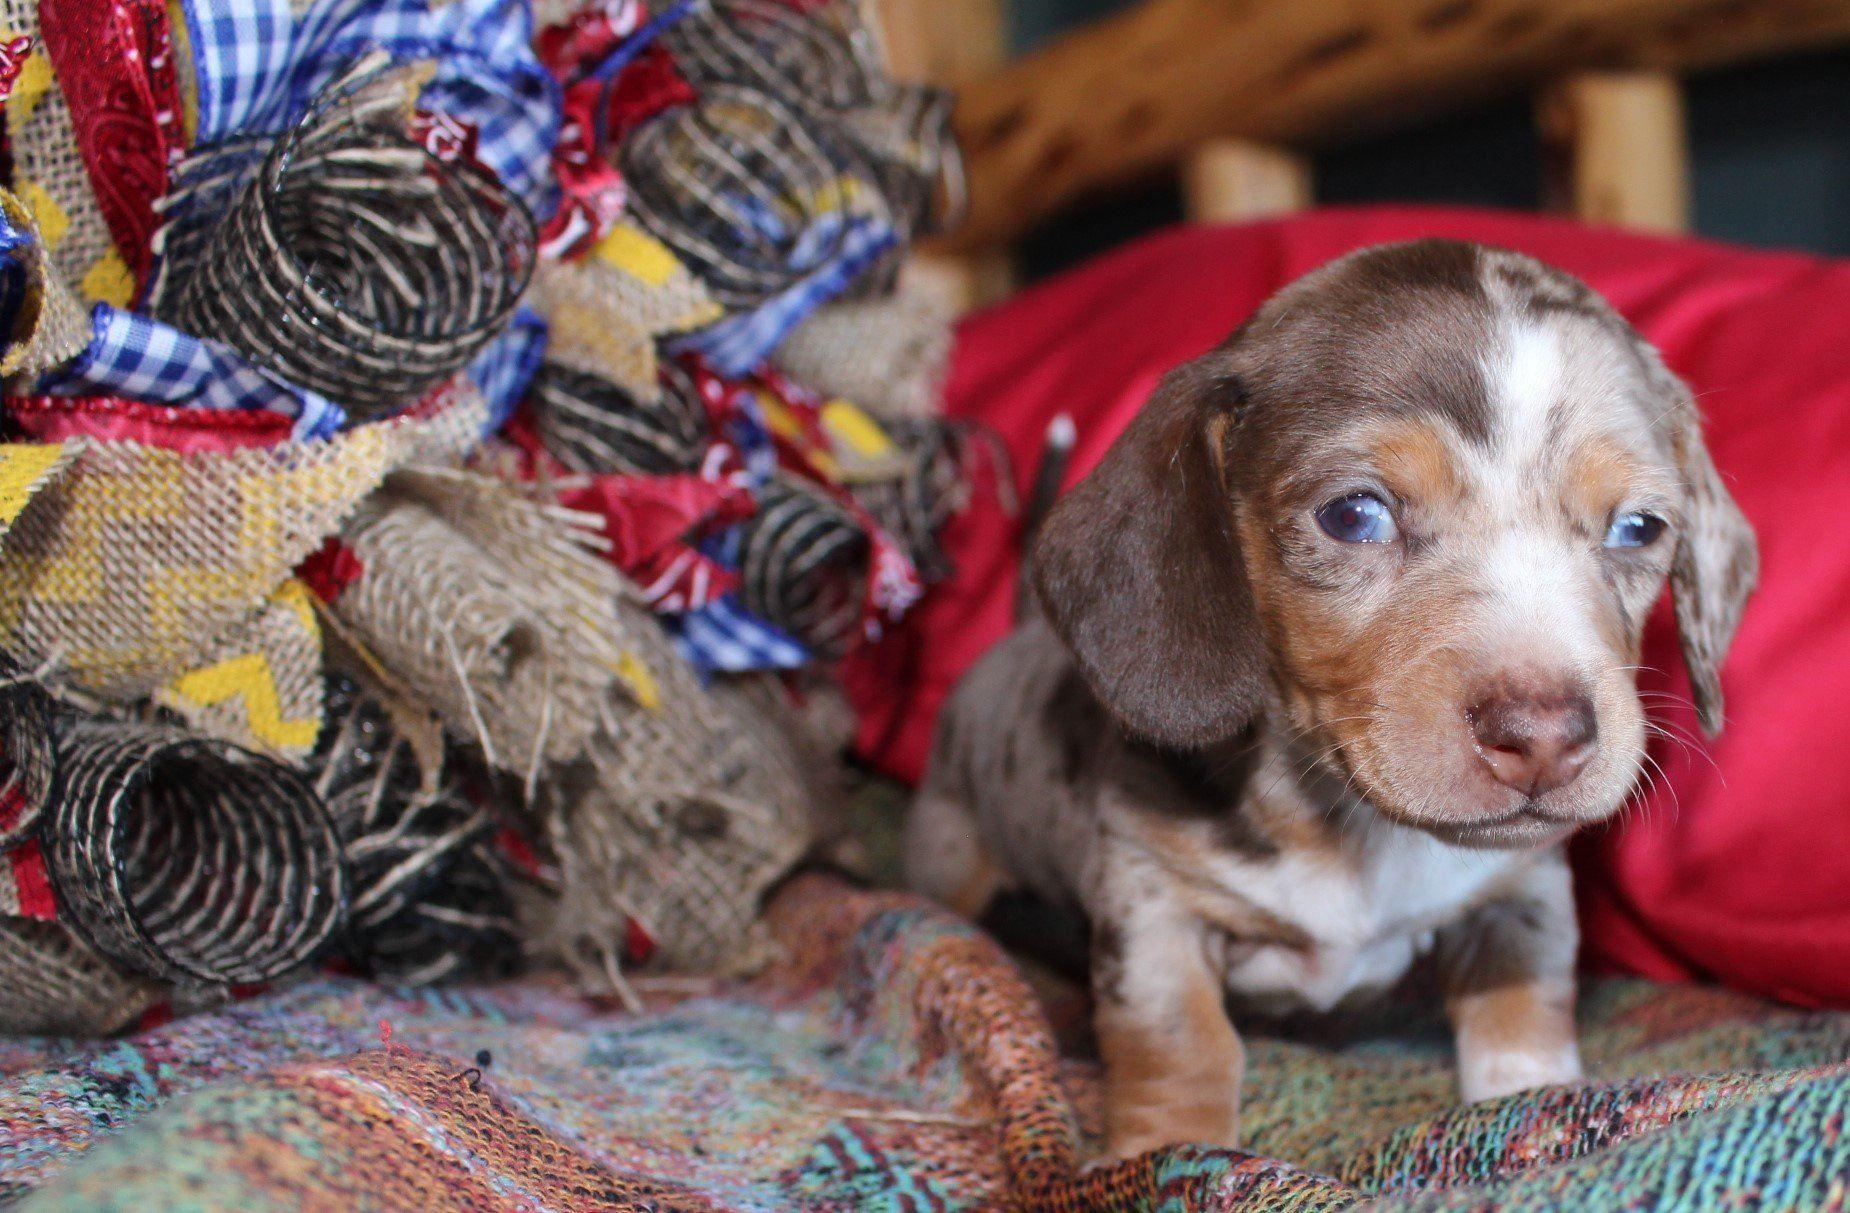 Gallery Dachshund puppies for sale, Mini dachshund